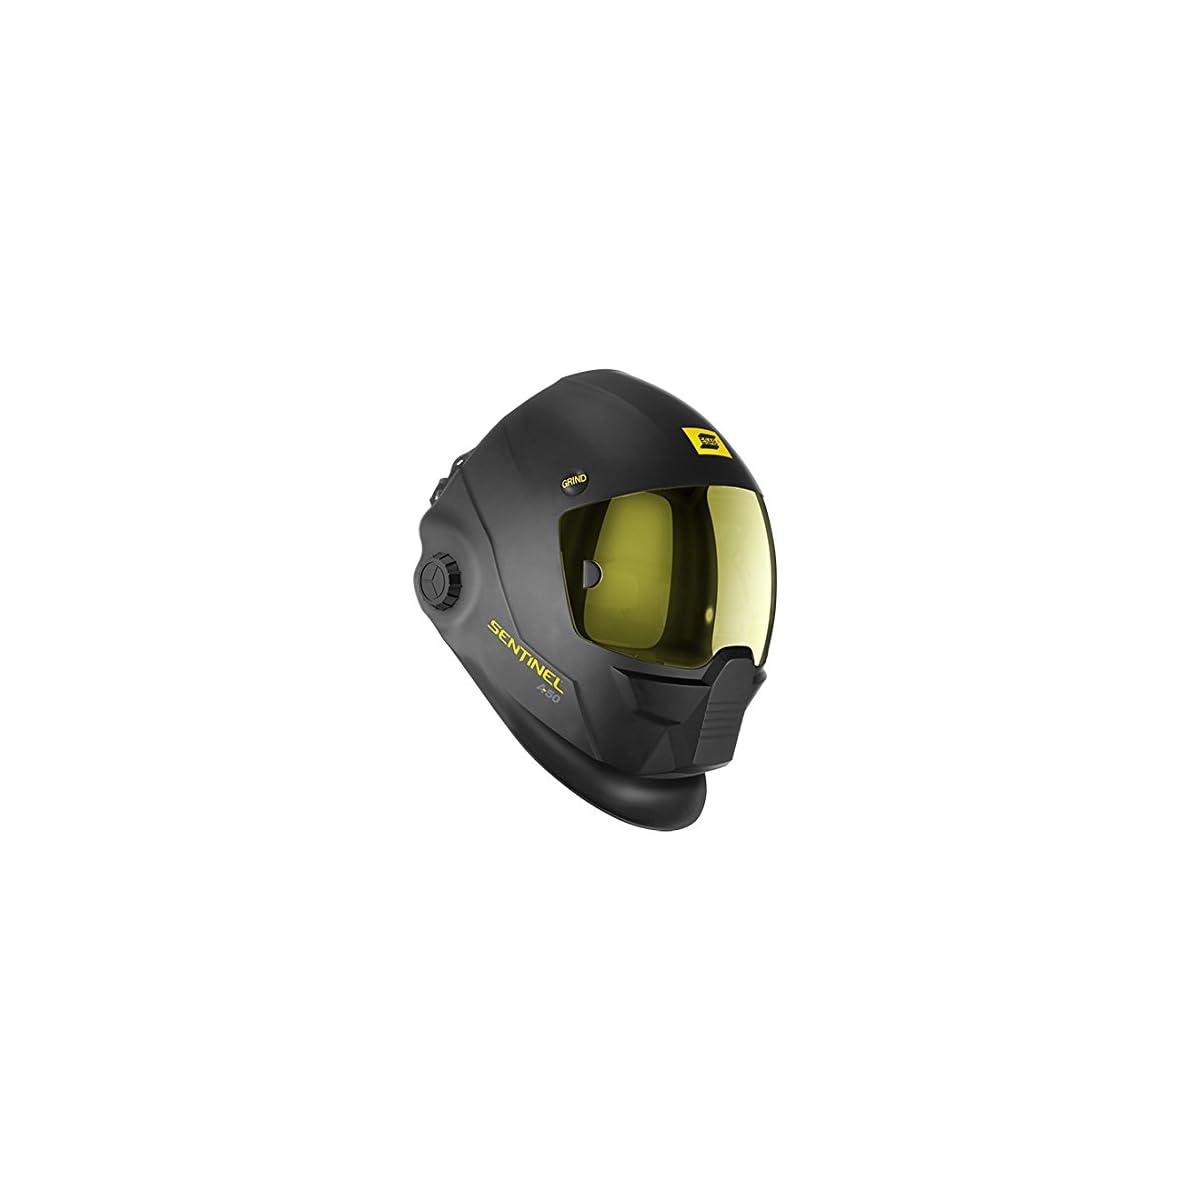 Hacks To Testing Auto-darkening Welding Helmets